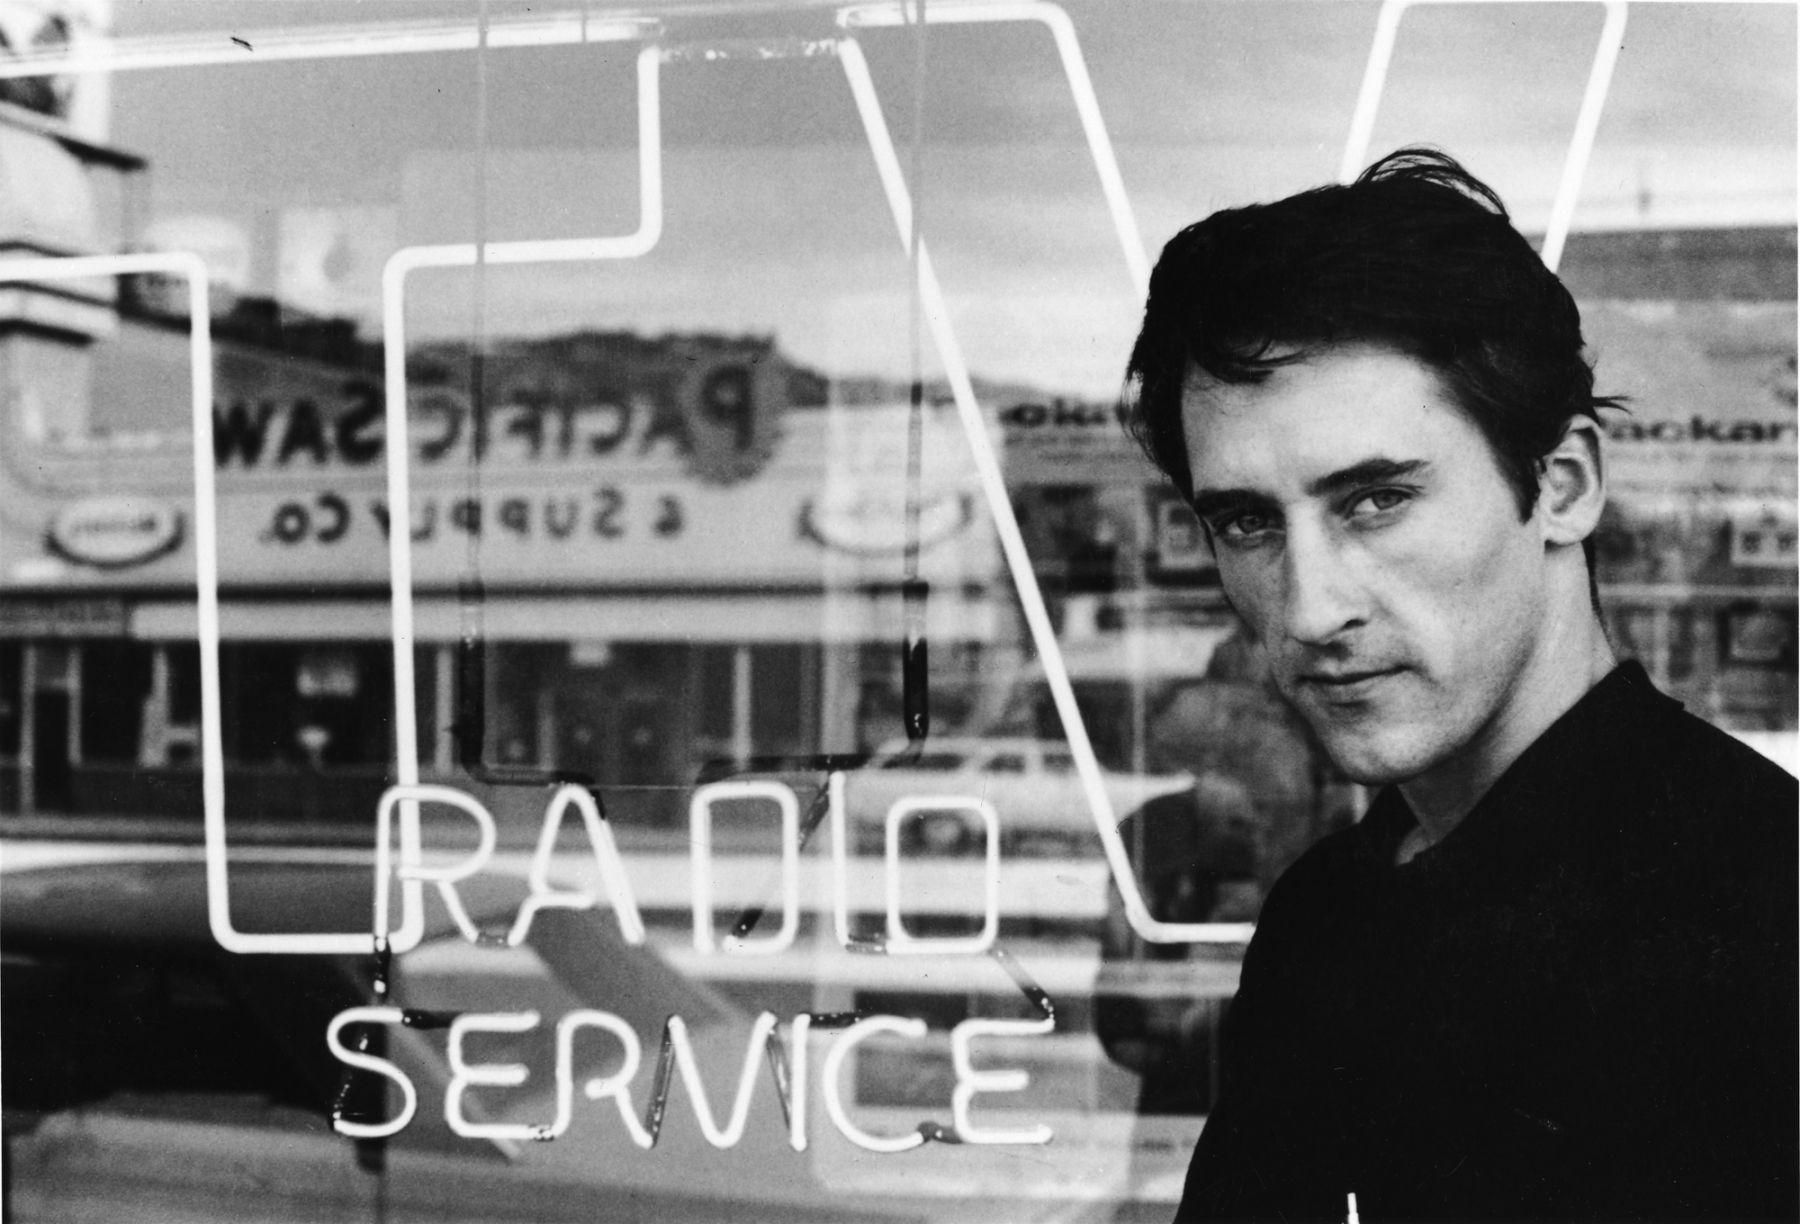 Ed Ruscha, 1964